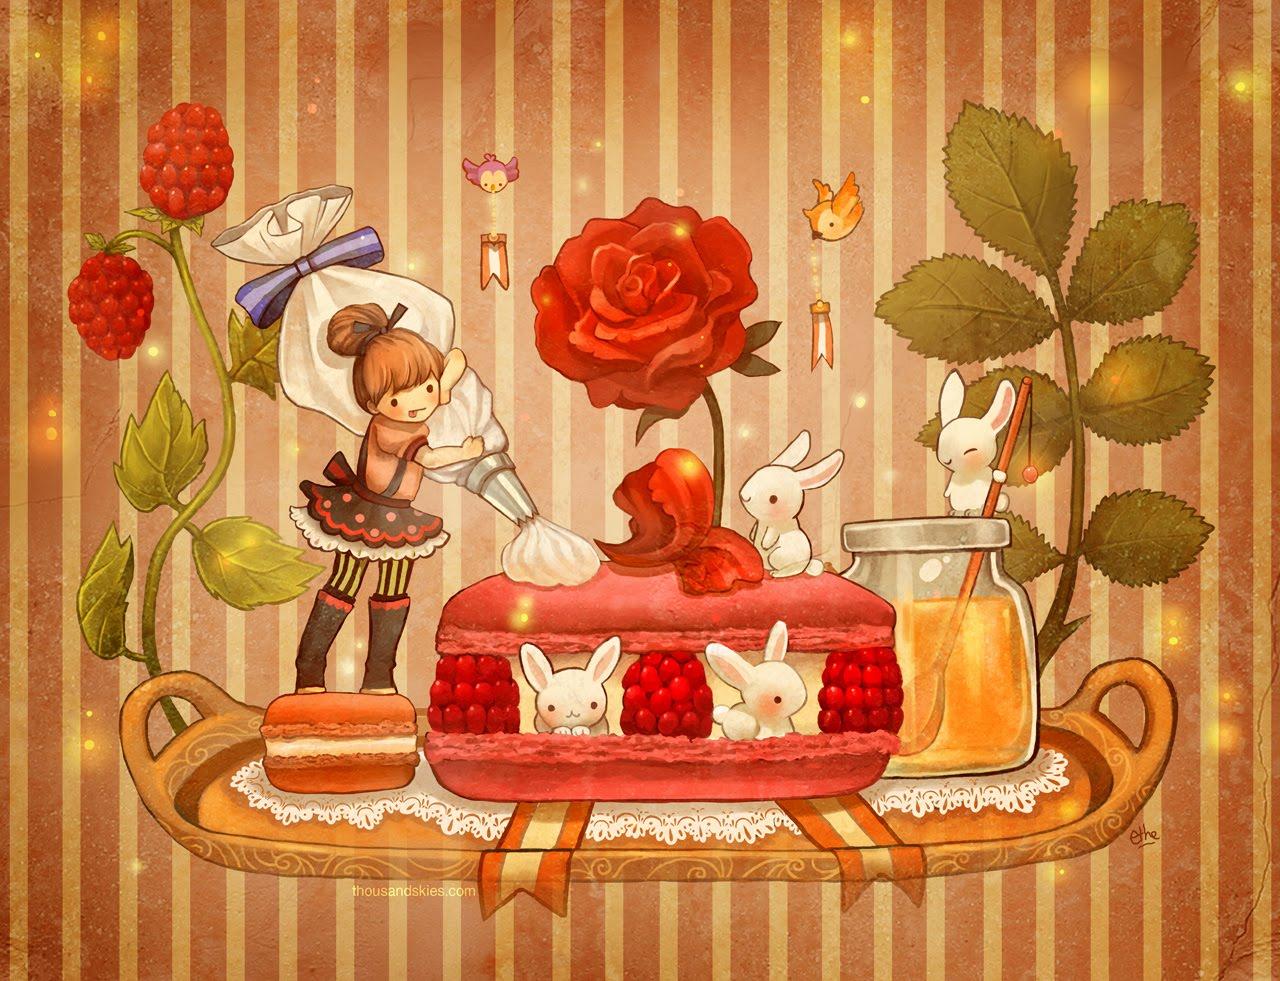 Macaron Story